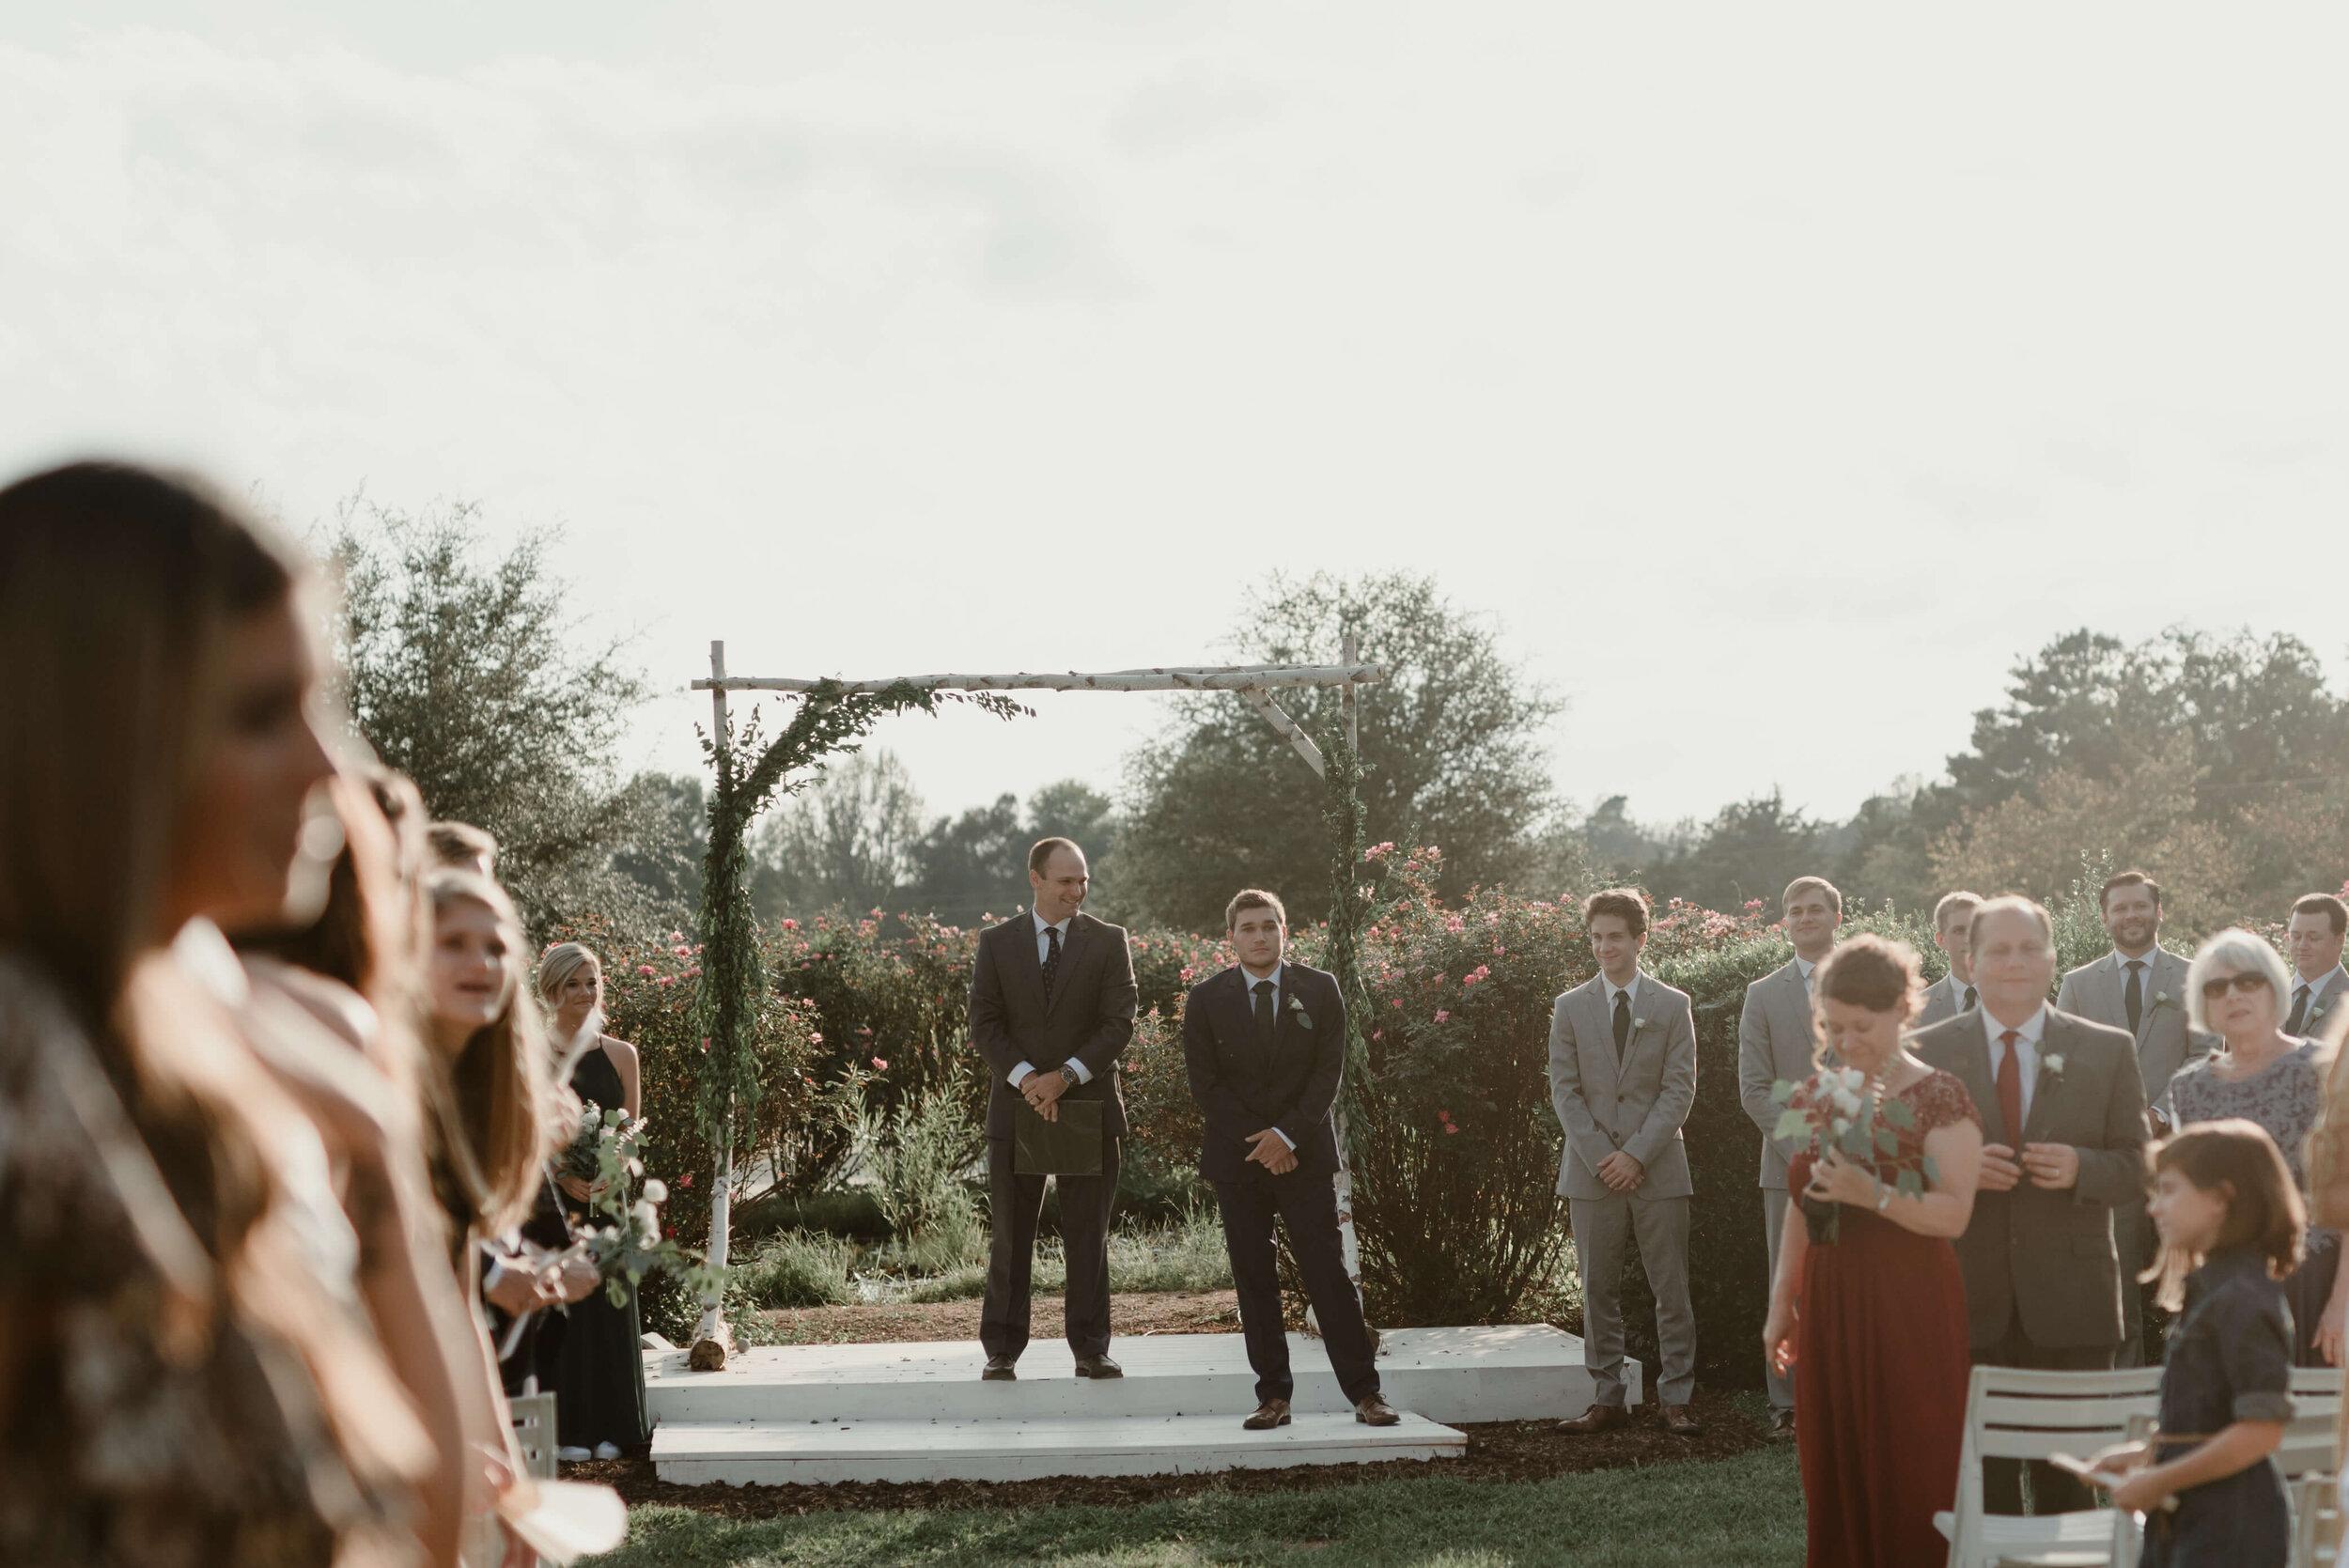 RALEIGH_WEDDING_GABBY_AND_SMITTYDSC_7639.jpg